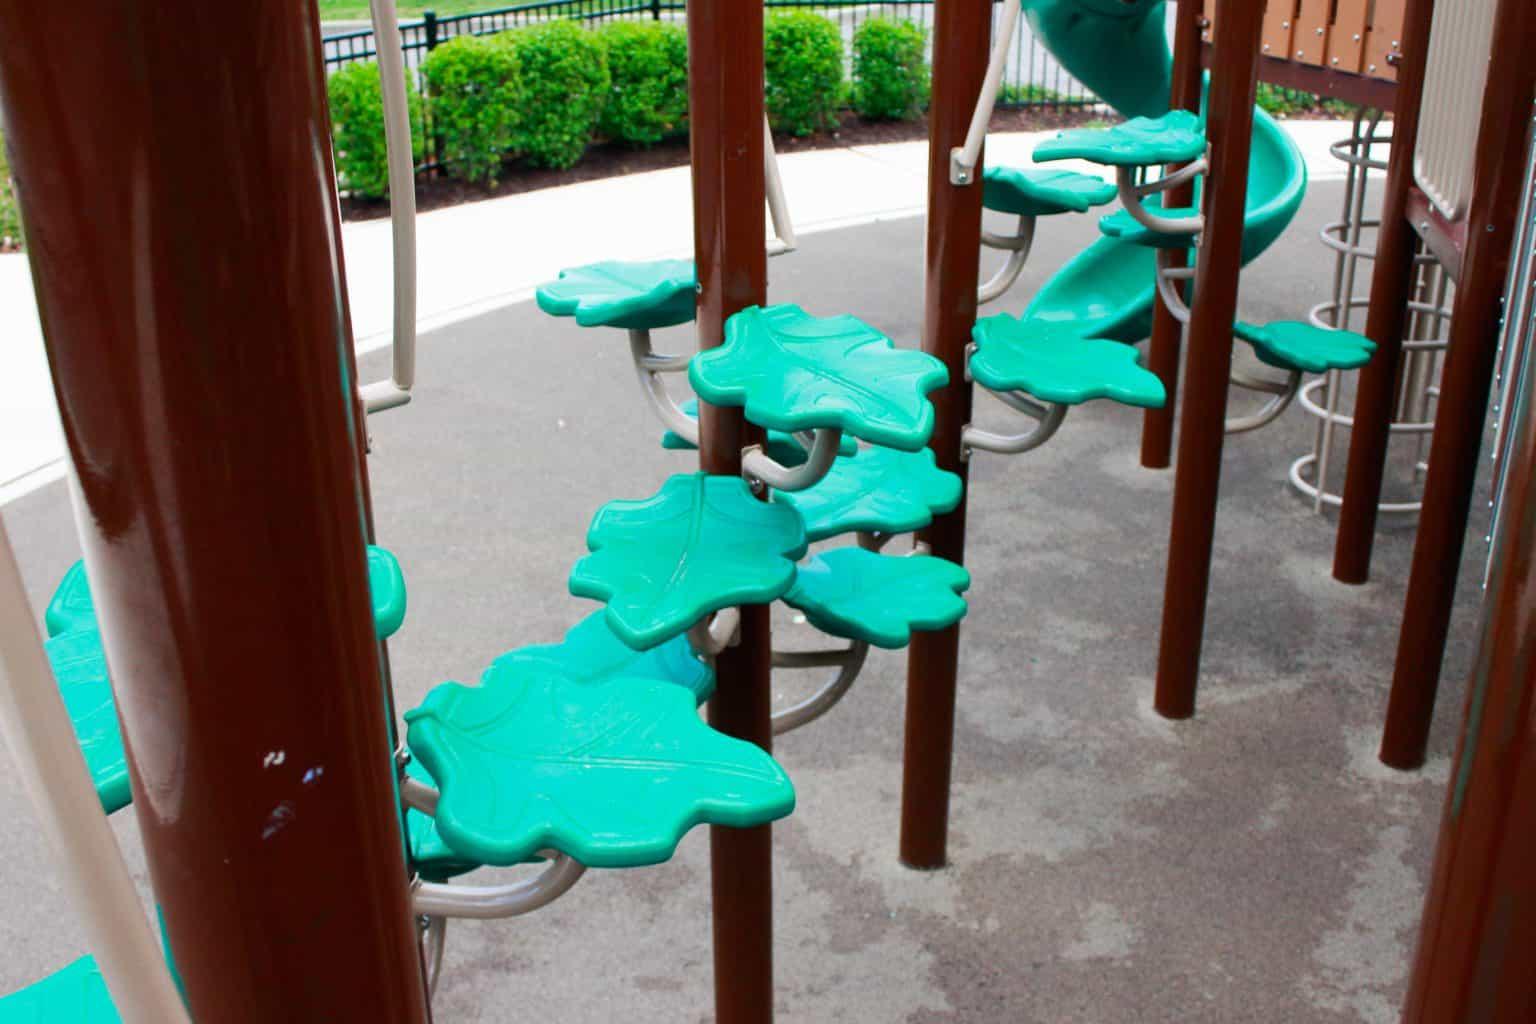 windward-beach-park-playground-brick-nj_28266702765_o-1536x1024